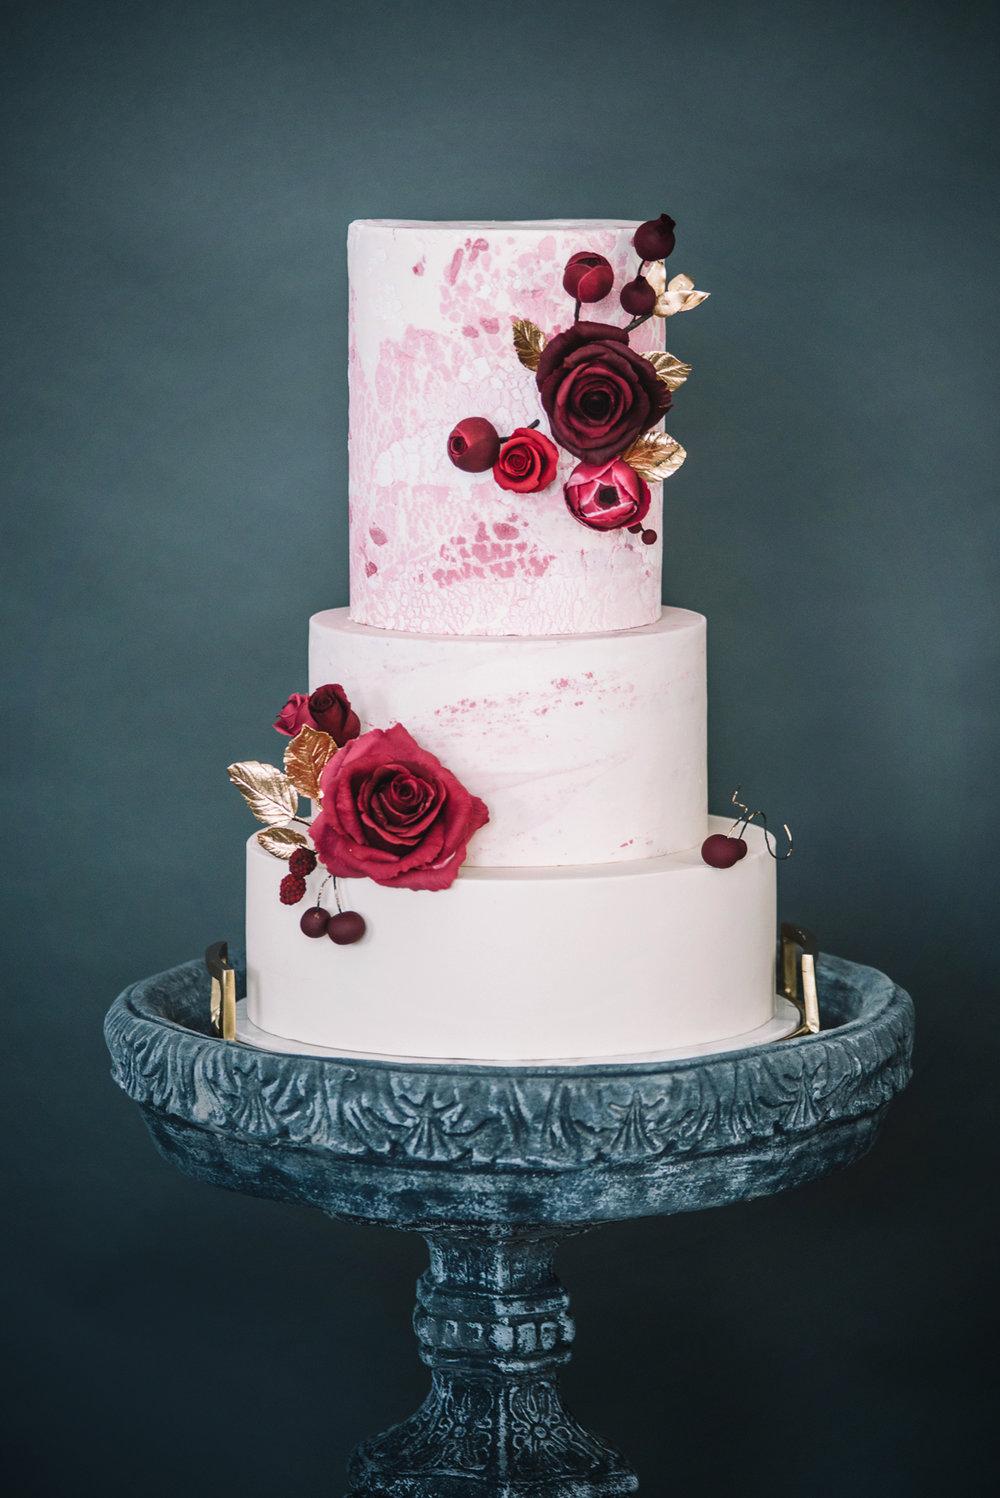 Cakes by angela morrison - http://www.cakesbyangelamorrison.com